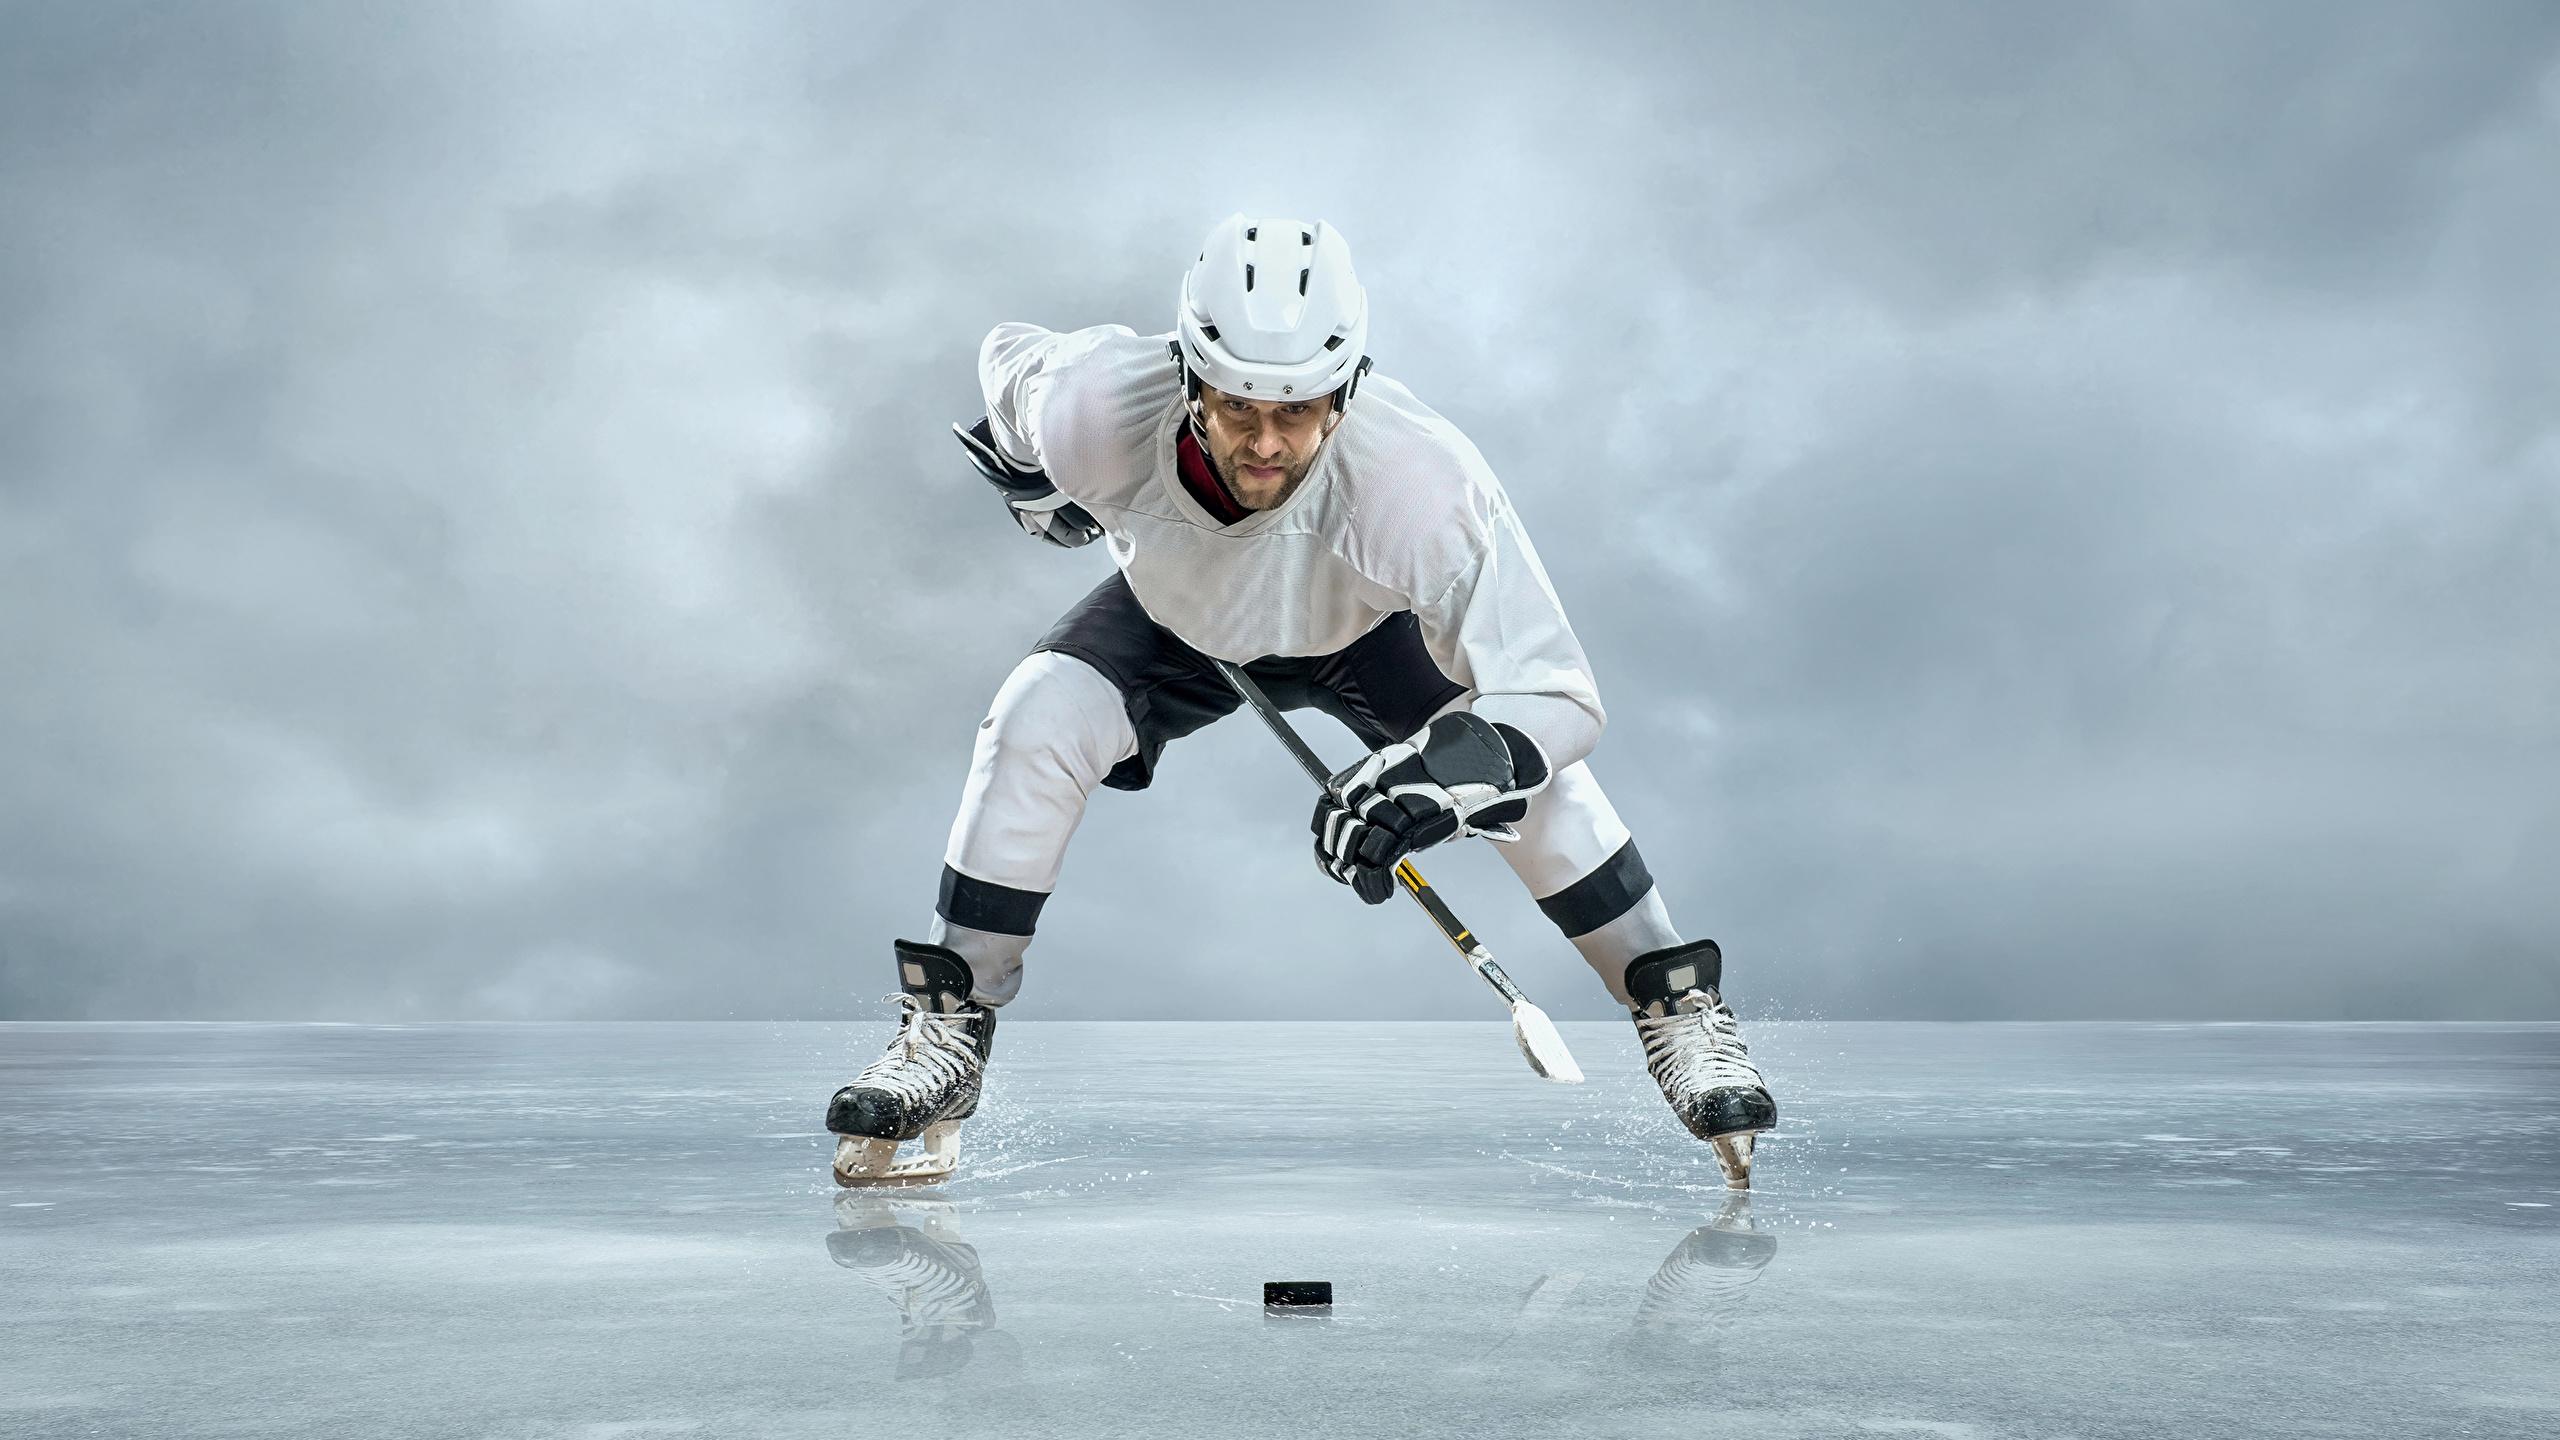 Desktop Wallpapers Ice Skate Men Helmet Ice Sport Hockey 2560x1440